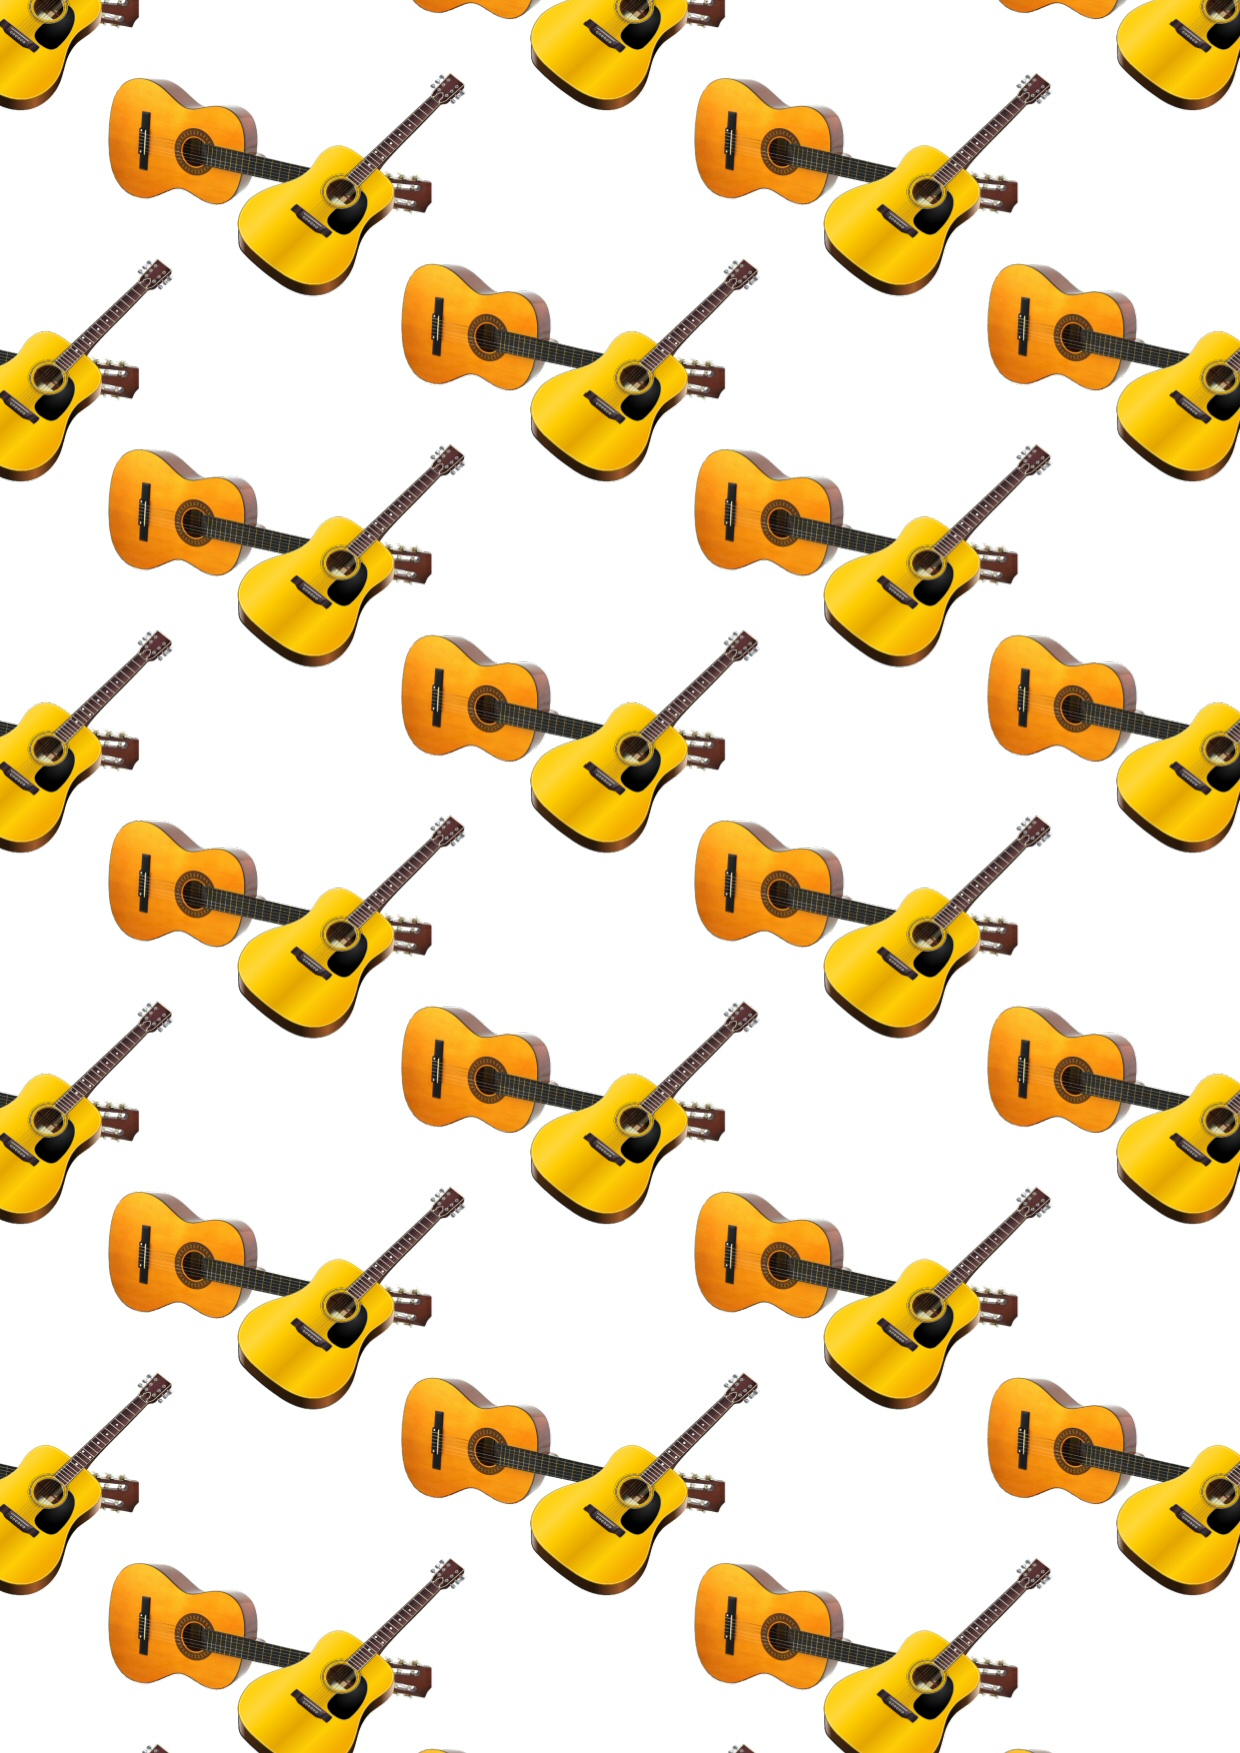 acoustic-guitar-02